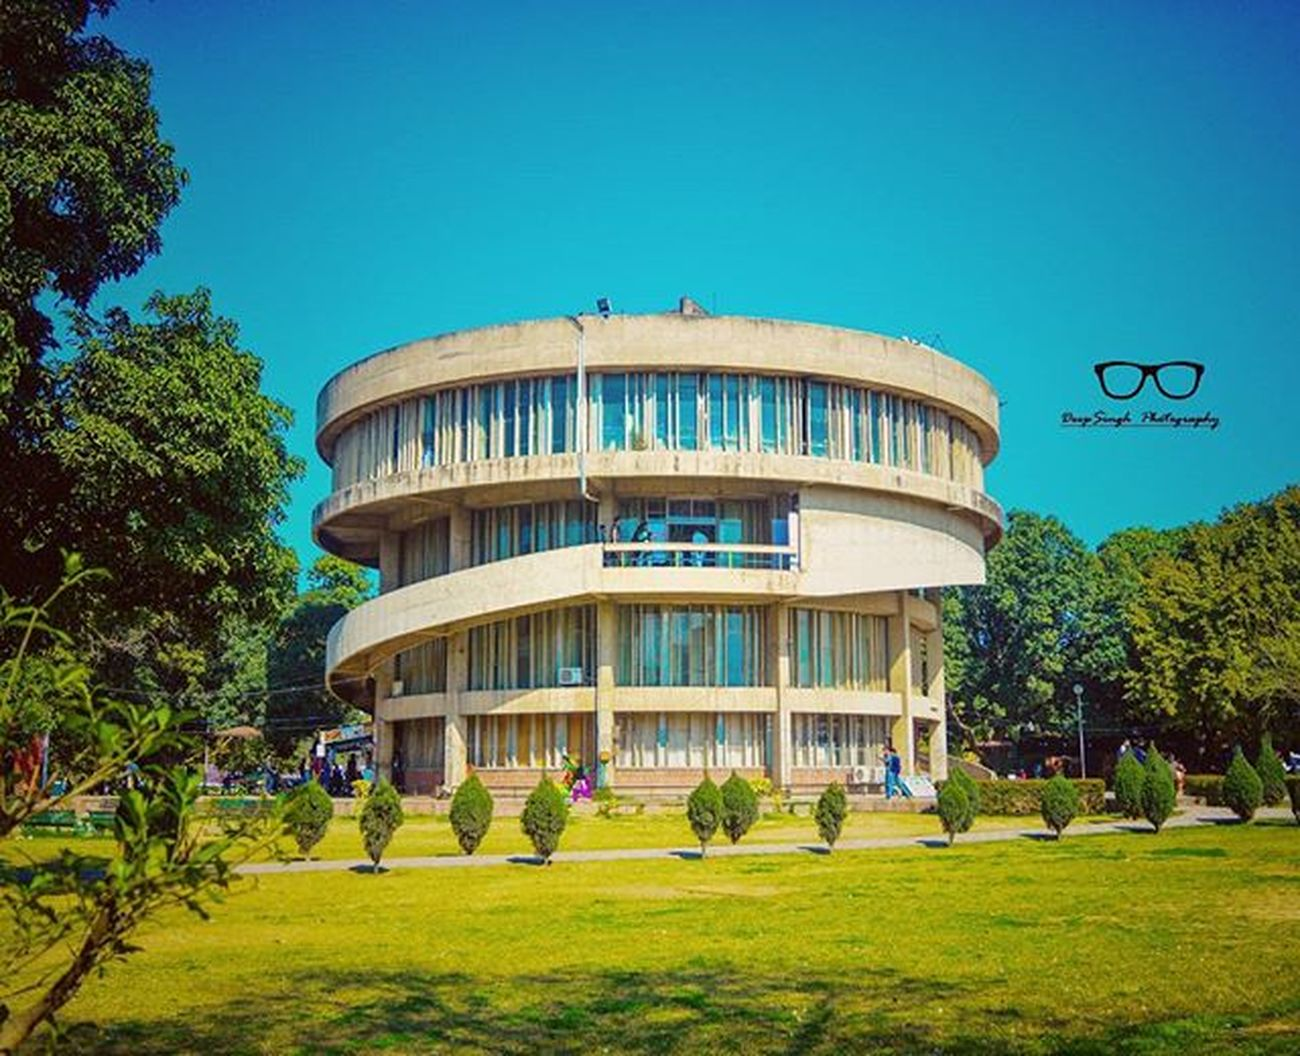 Stuceee Punjabuniversity Chandigarh Nikonphotography DeepSinghPhotography Followplease DeepSinghPhotography Nikon Best